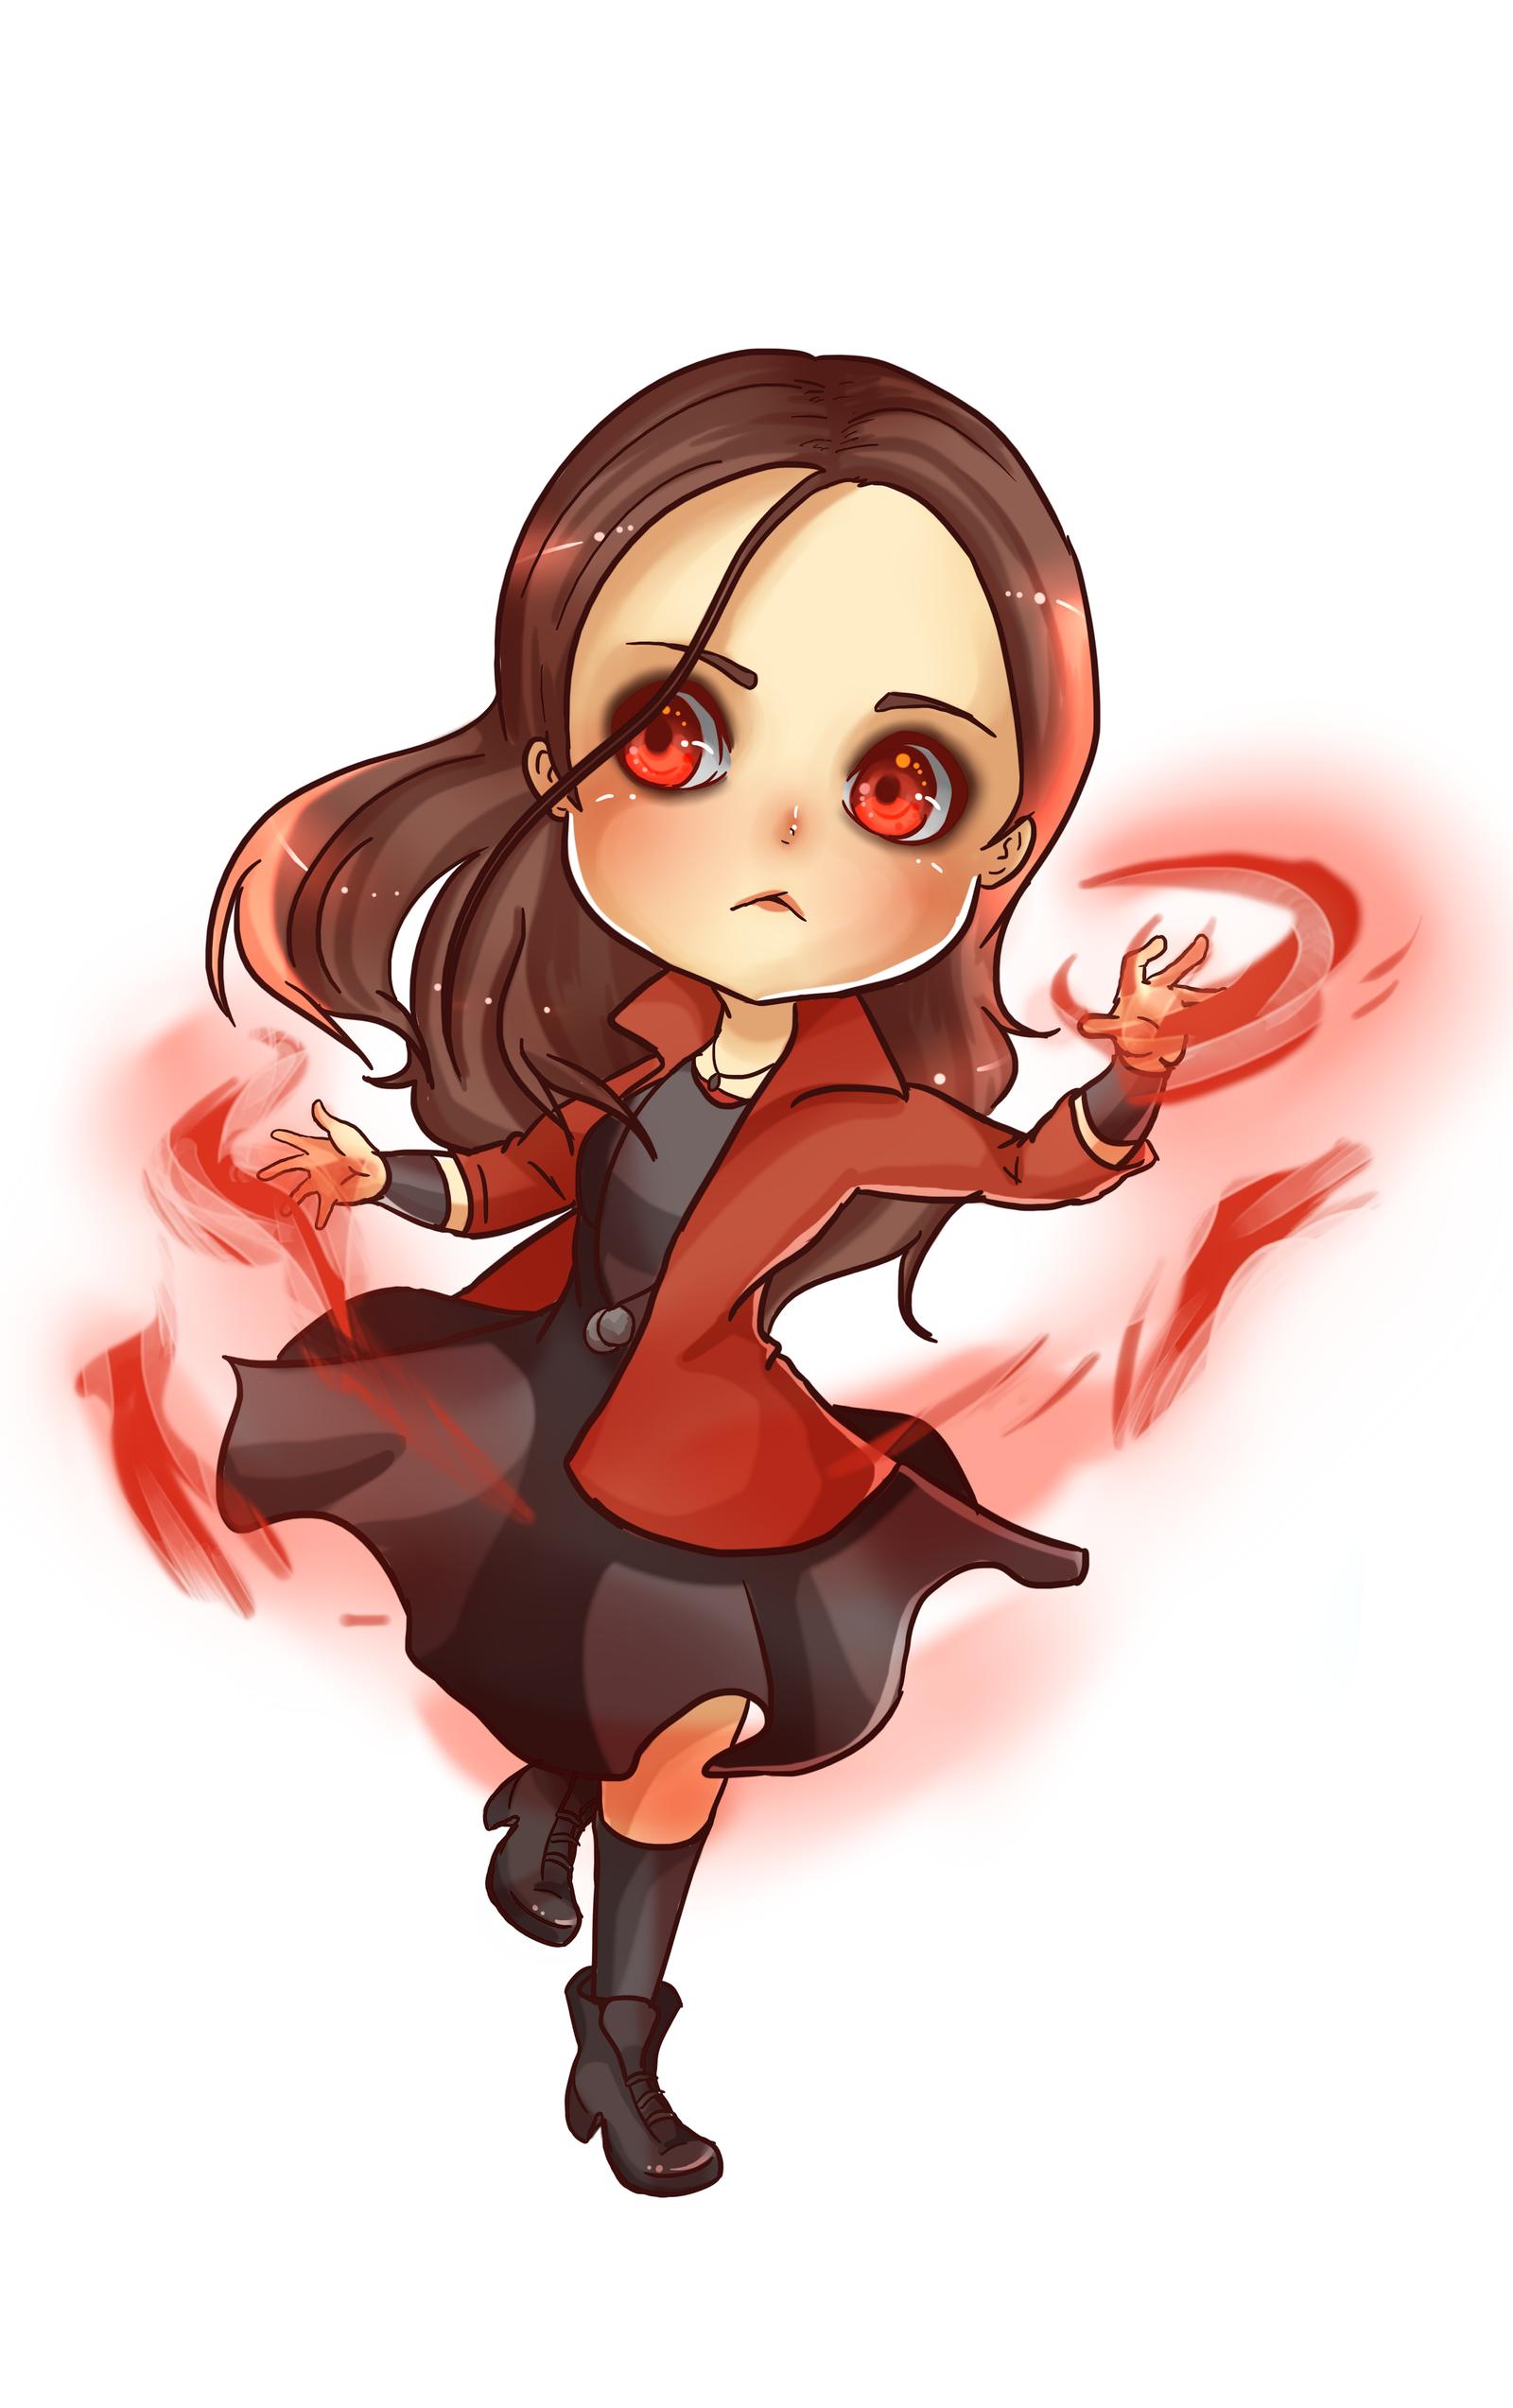 Cute Chibi Scarlet Witch Www Imagessure Com